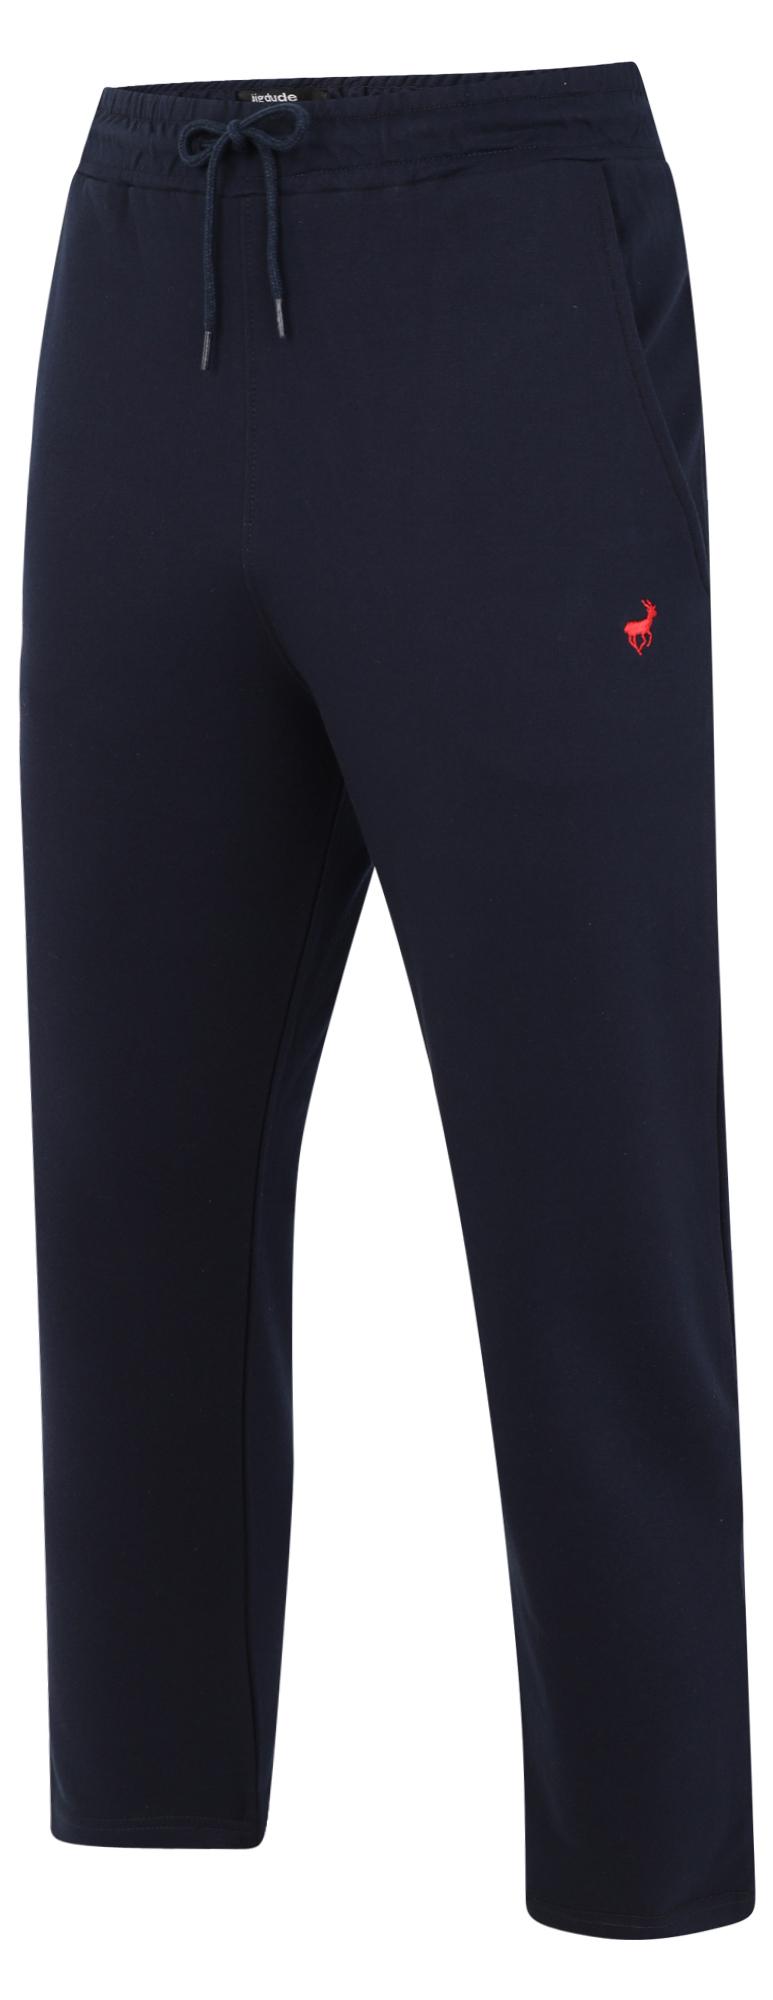 Mens Big Size Joggers Trousers Bottoms Open Hem Short Or Regular Leg 2-8XL KAM